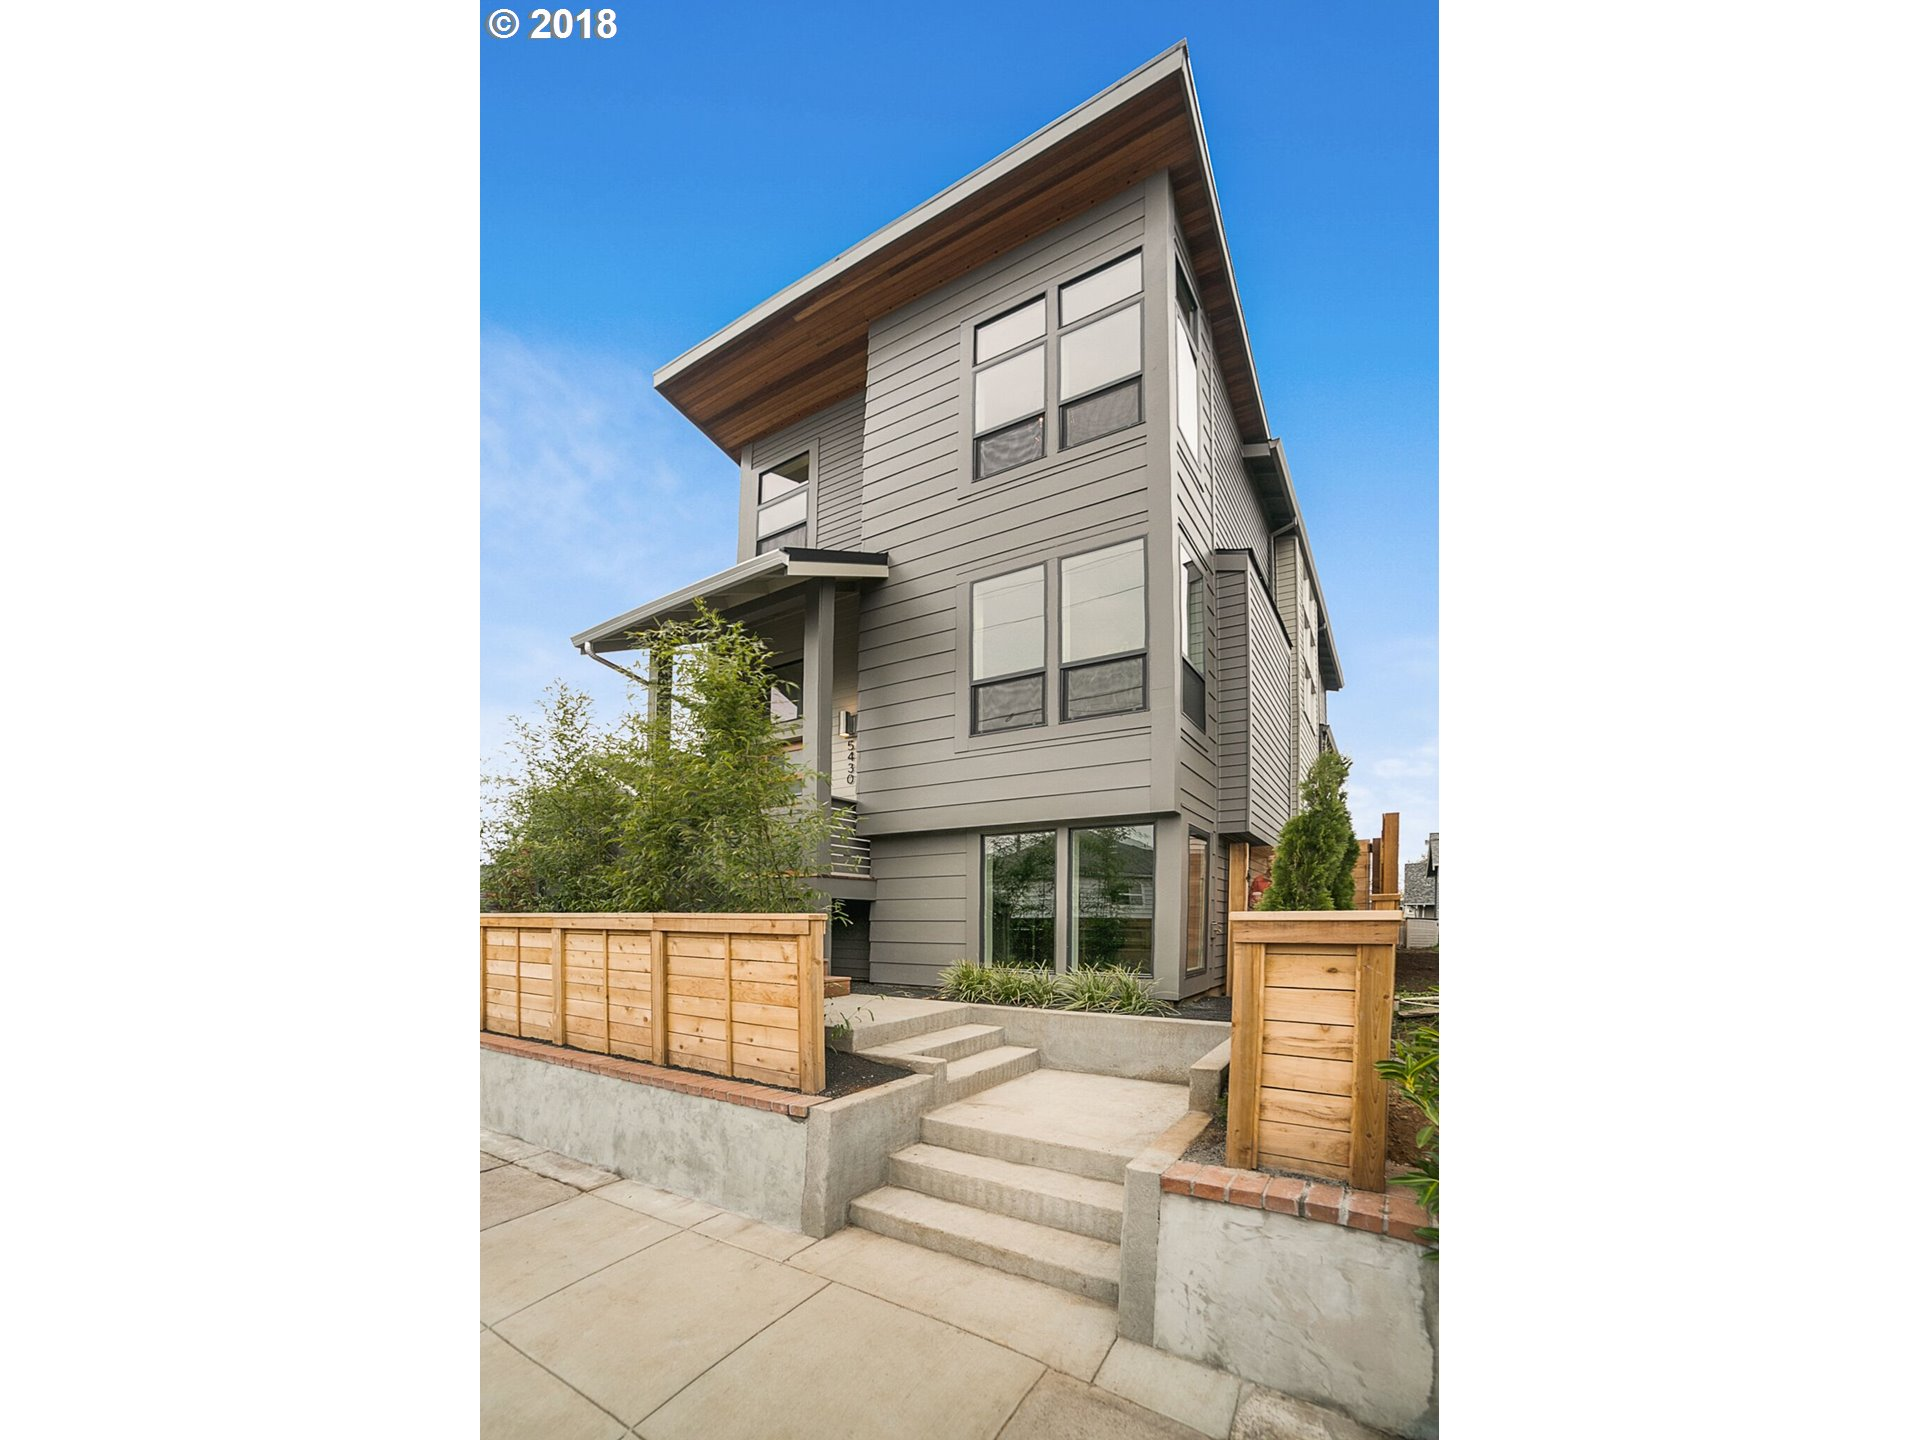 5430 NE 24TH AVE, Portland OR 97211